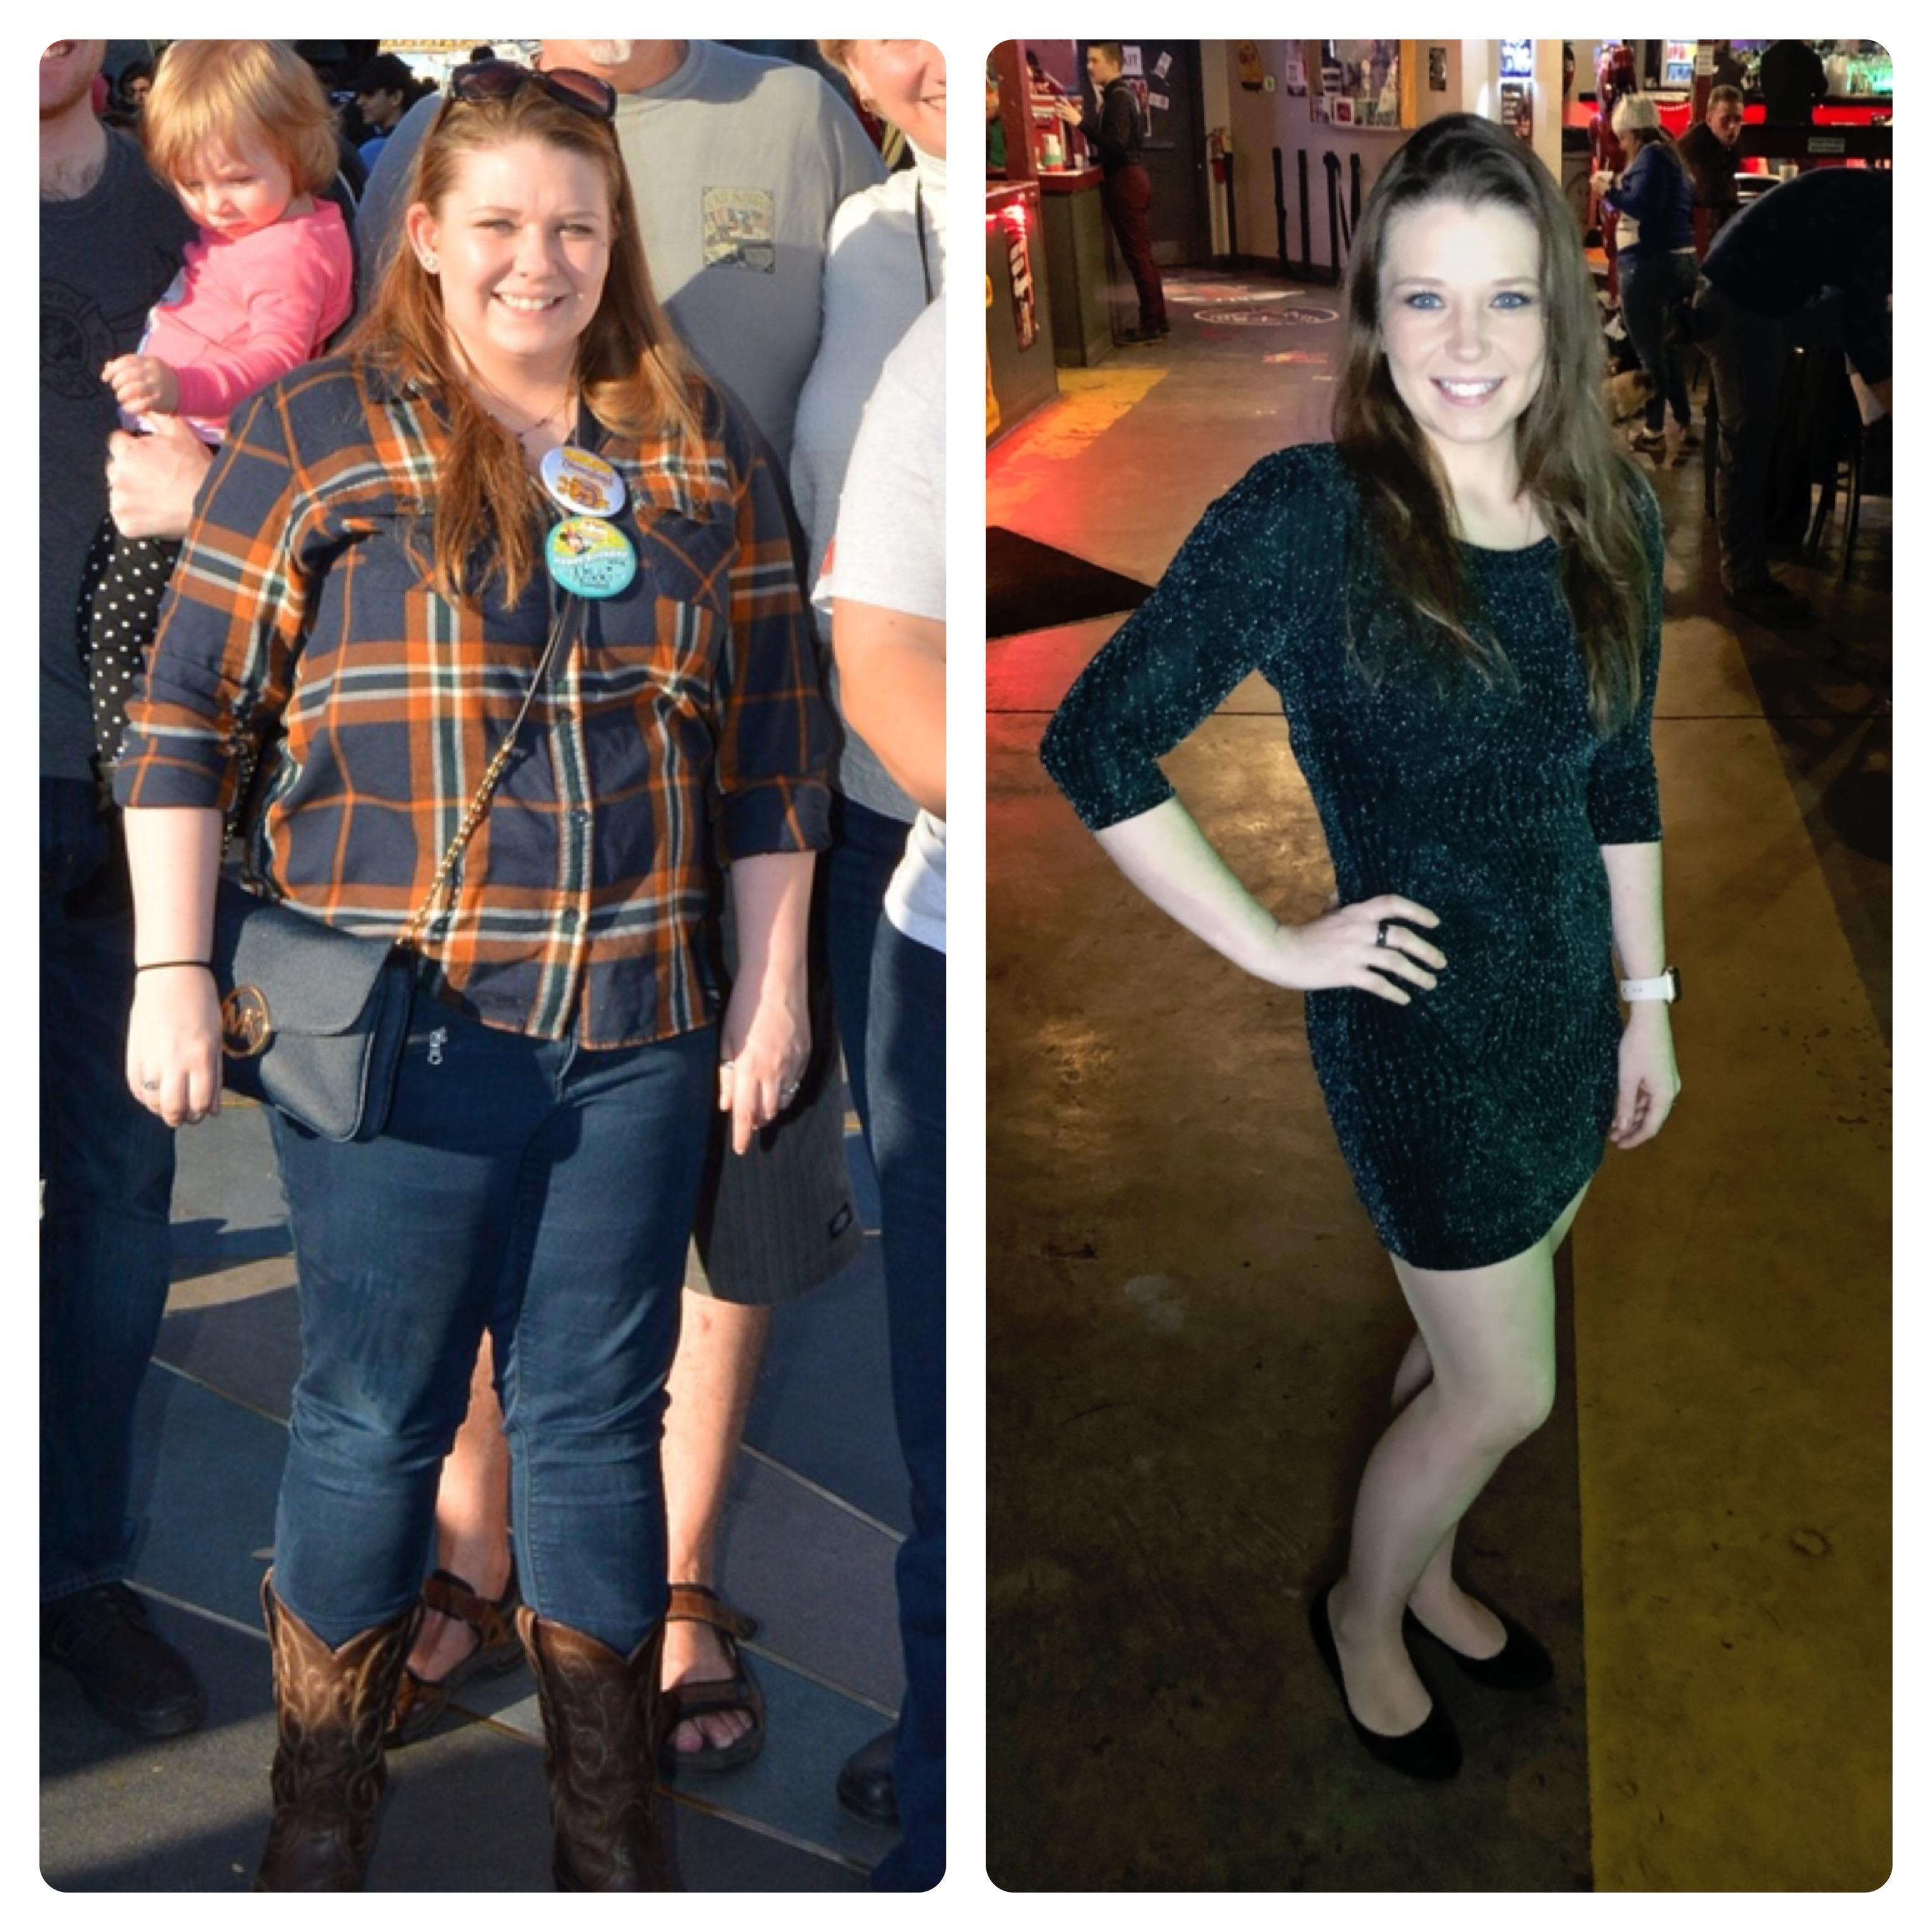 78 lbs Fat Loss 5 foot 1 Female 198 lbs to 120 lbs